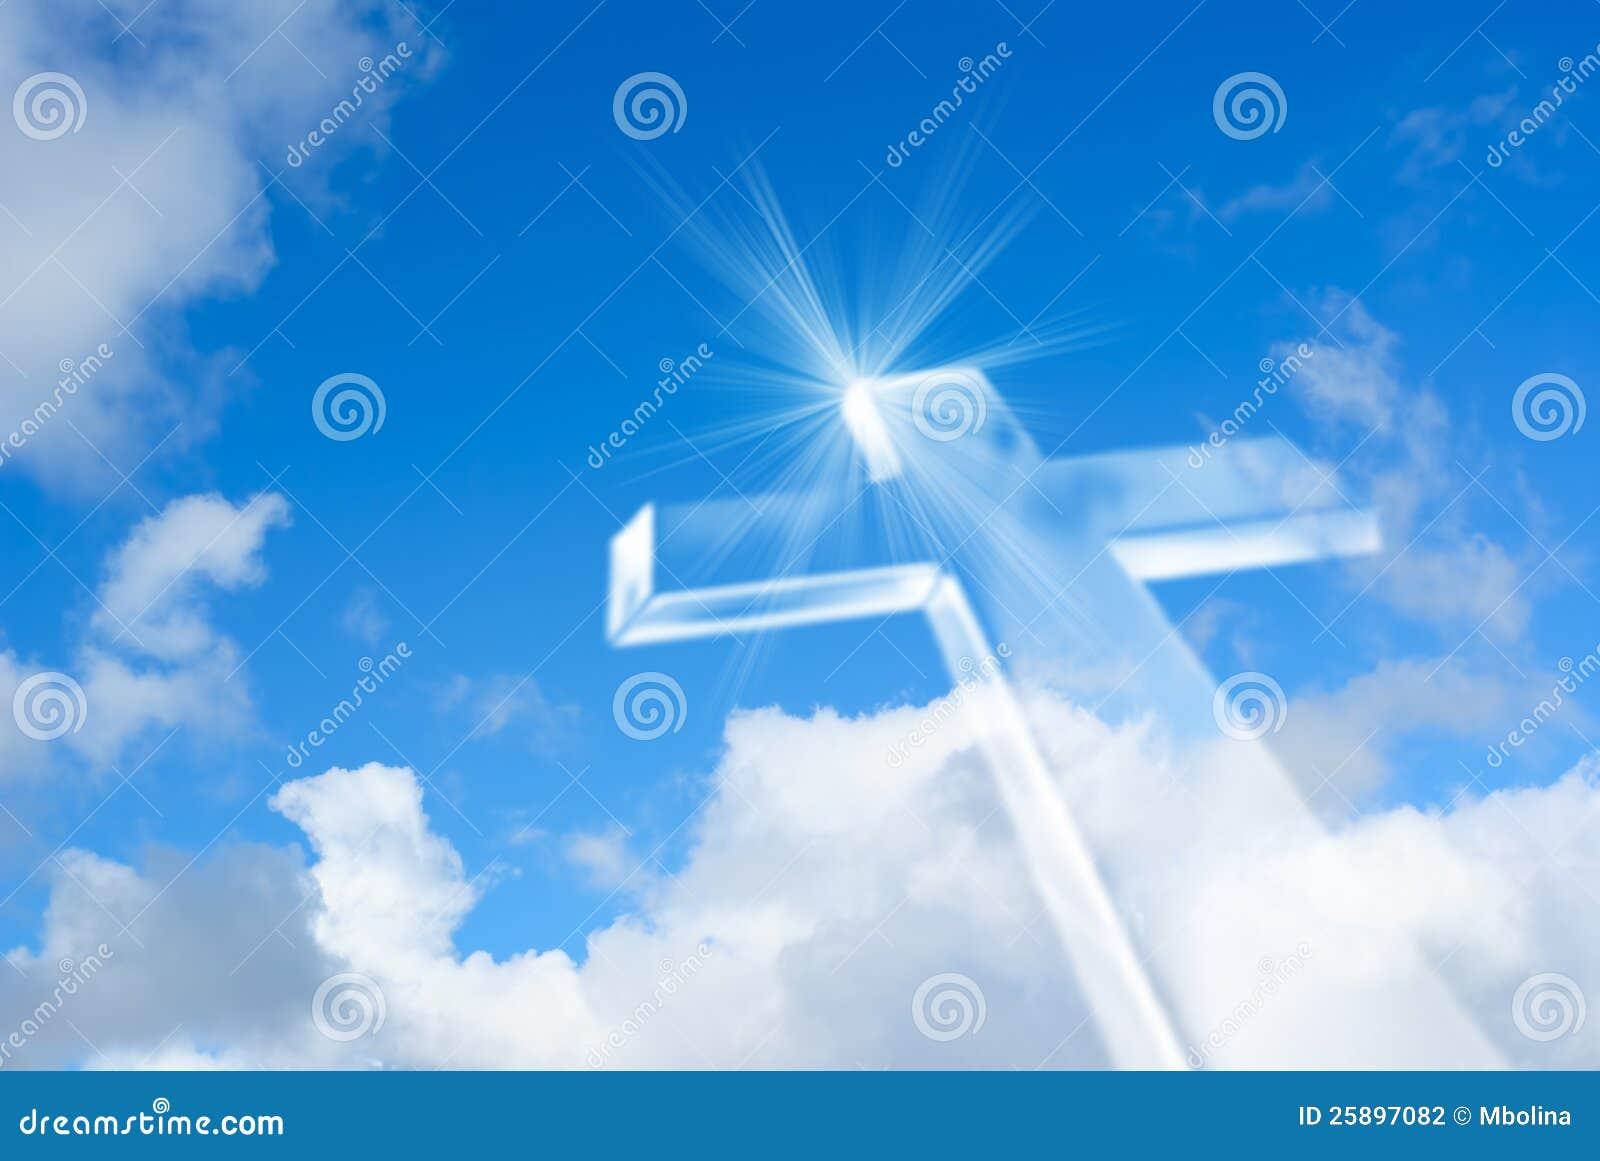 Beaming Bright White Cross In Heaven Stock Photo Image